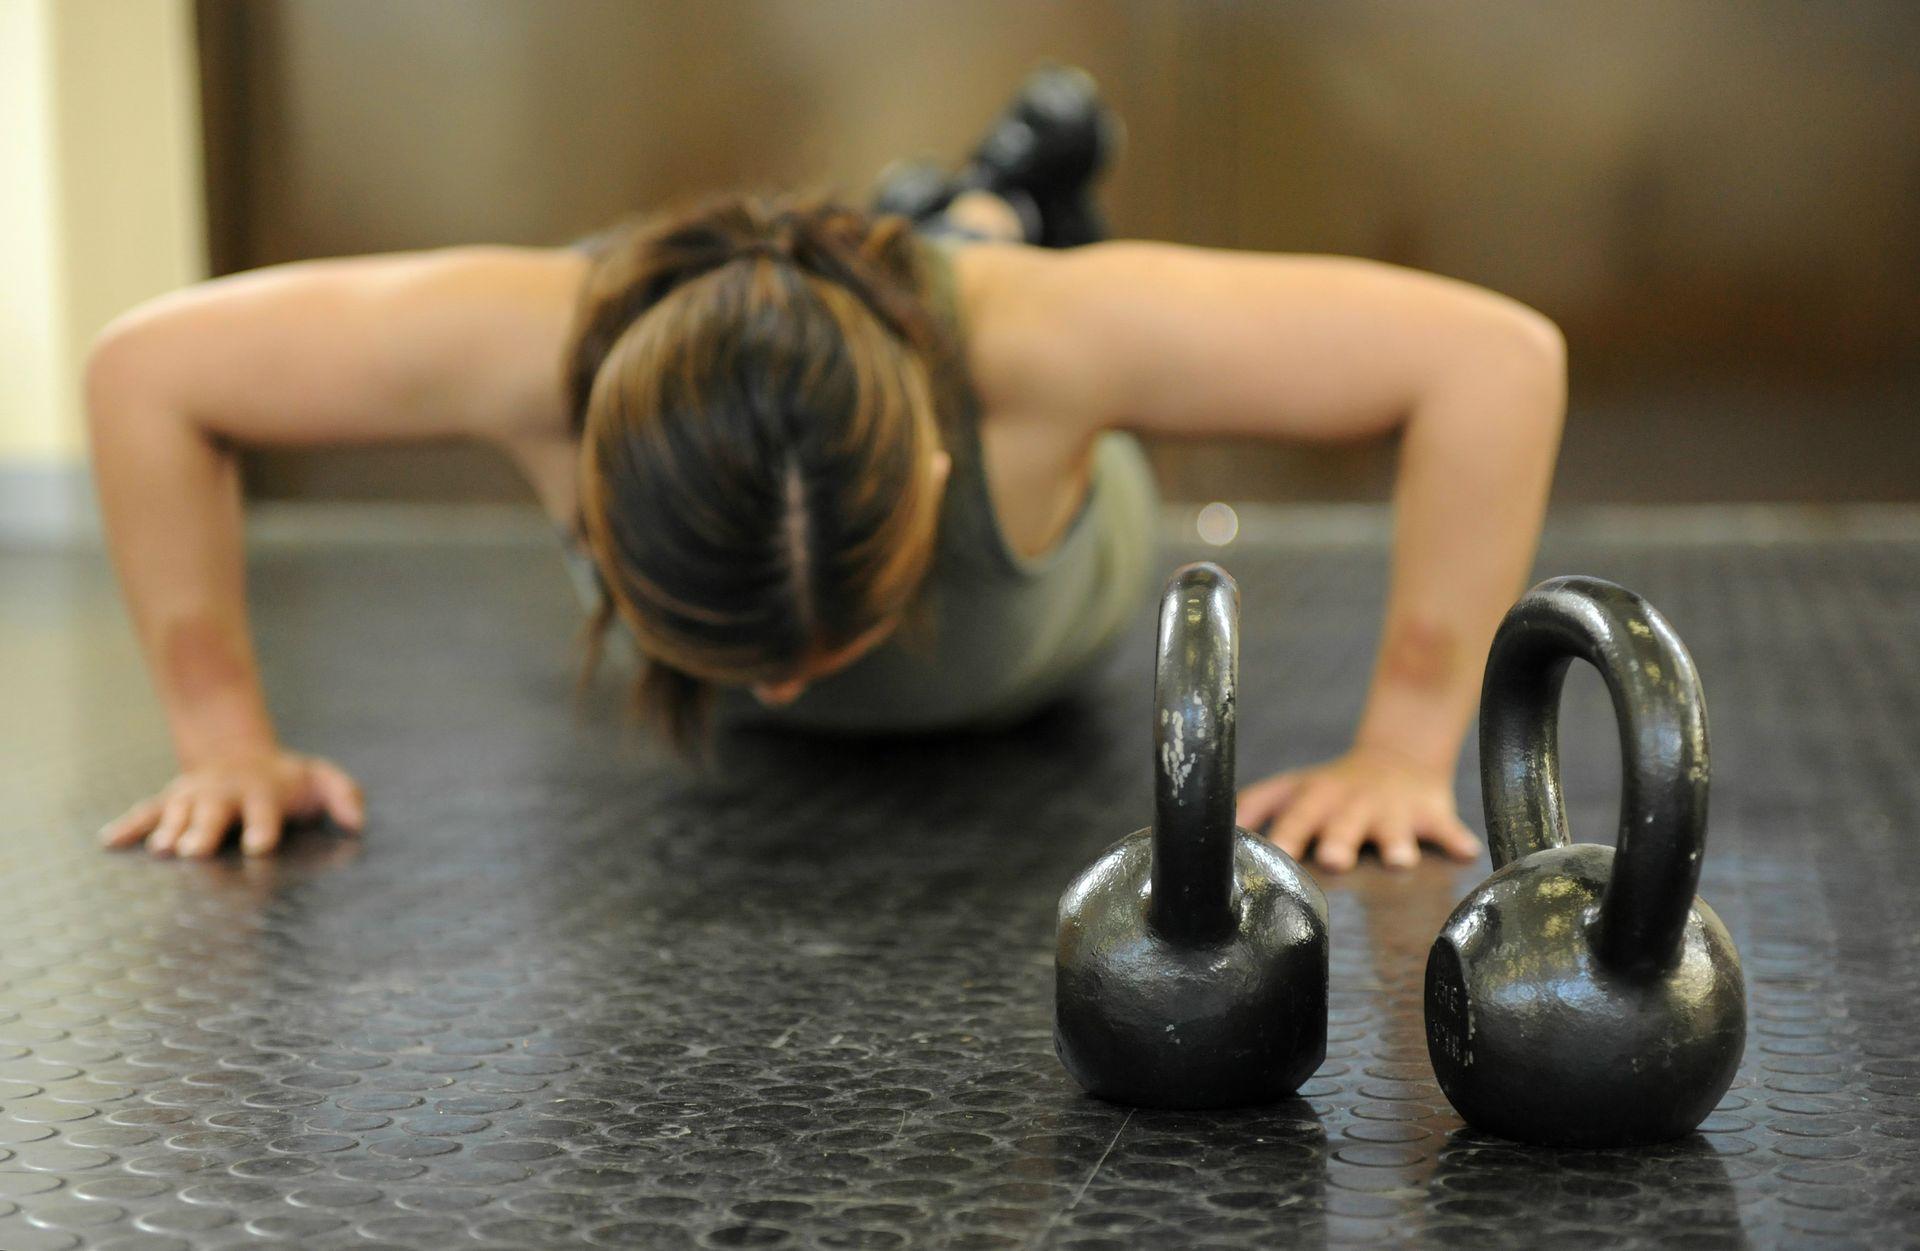 110413-f-ms171-013-fitness